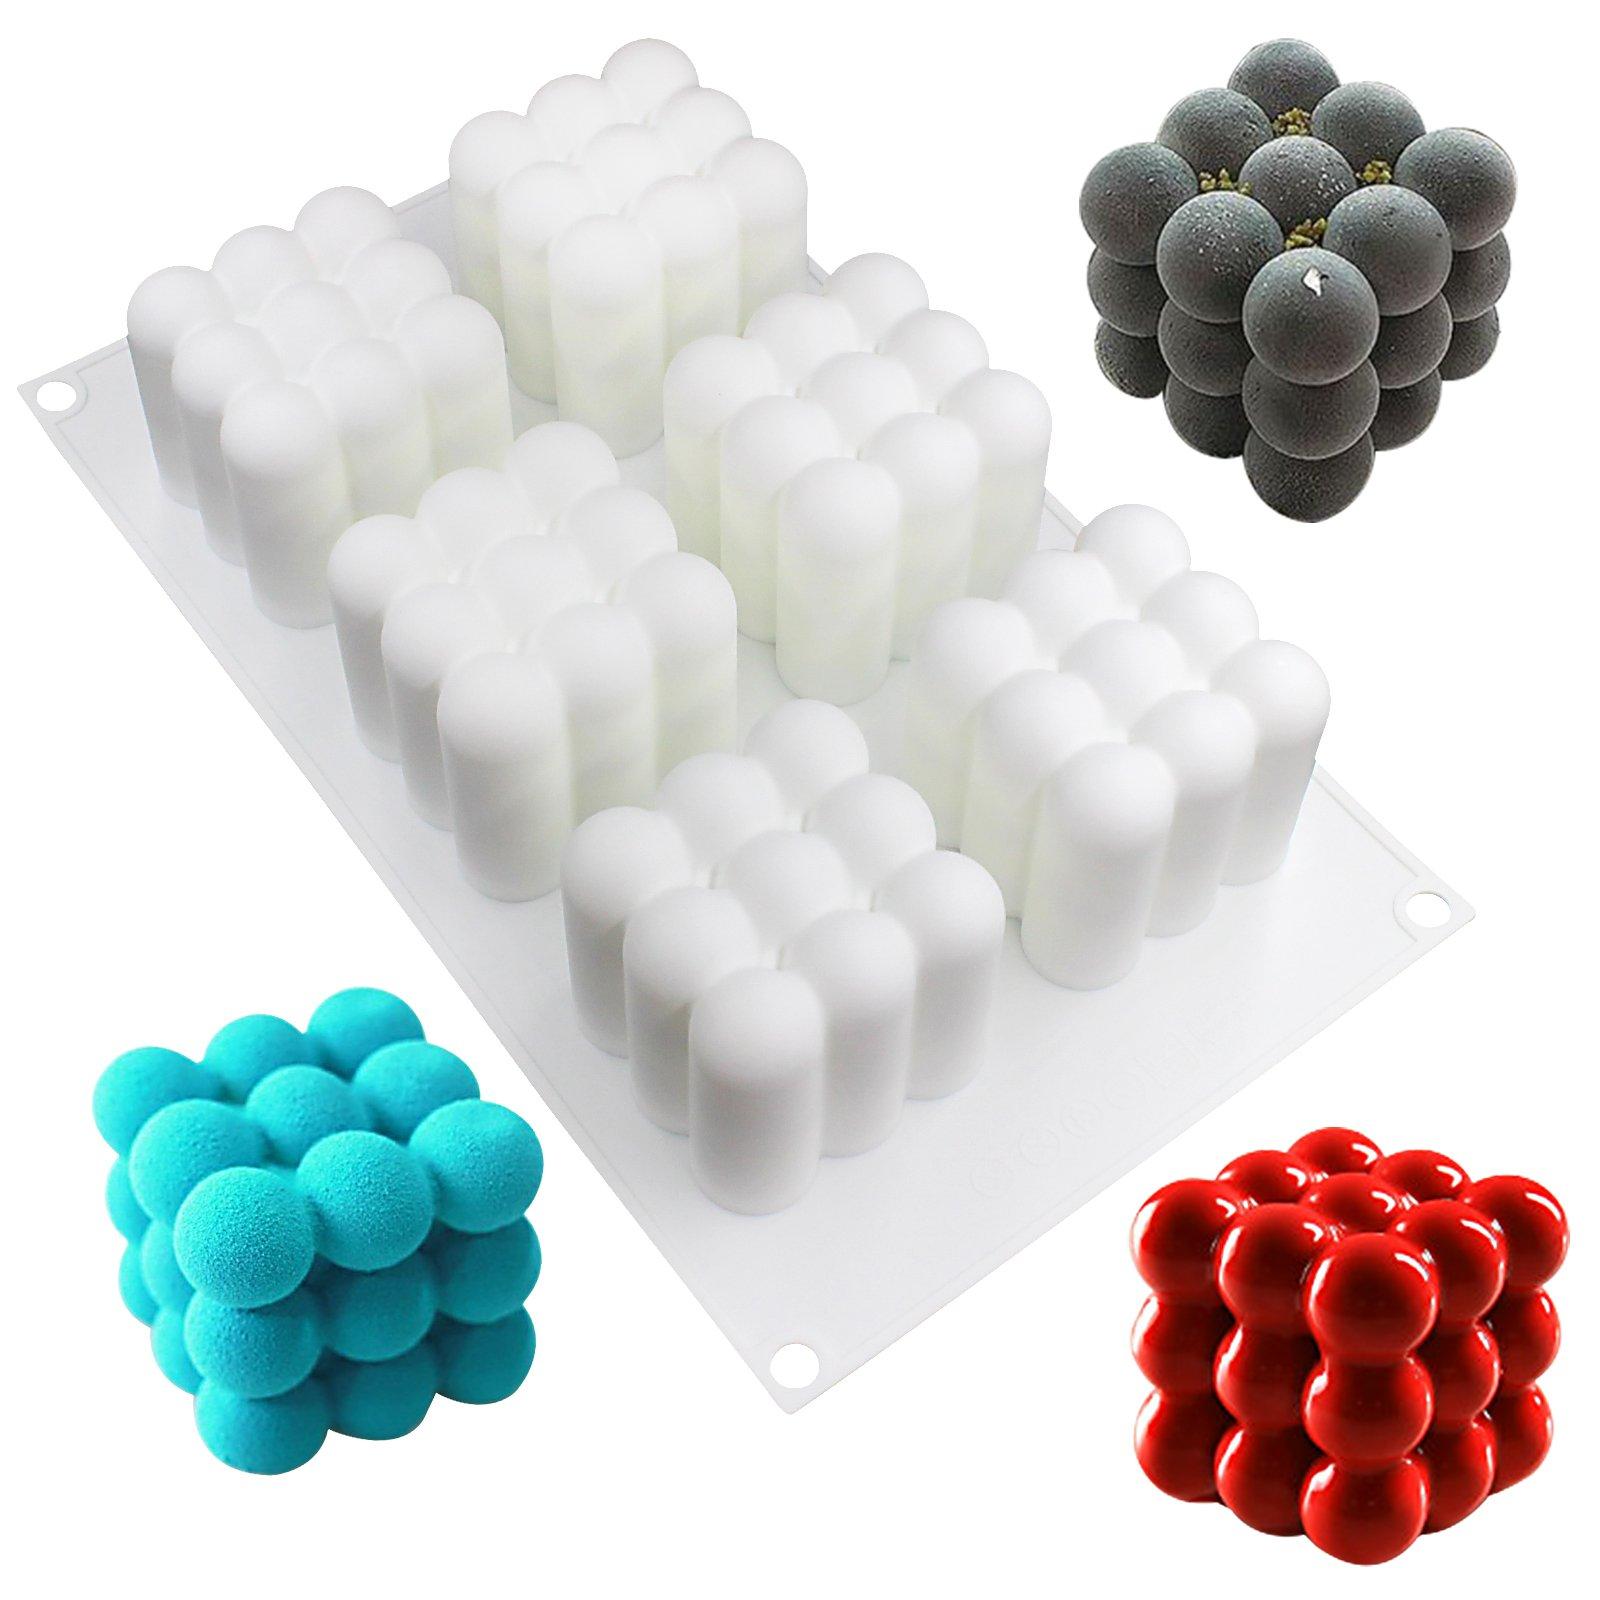 FUNSHOWCASE 6 Cavities Magic Cubes Silicone Mold Tray per Cavity 2.4x2.4x2.4inch